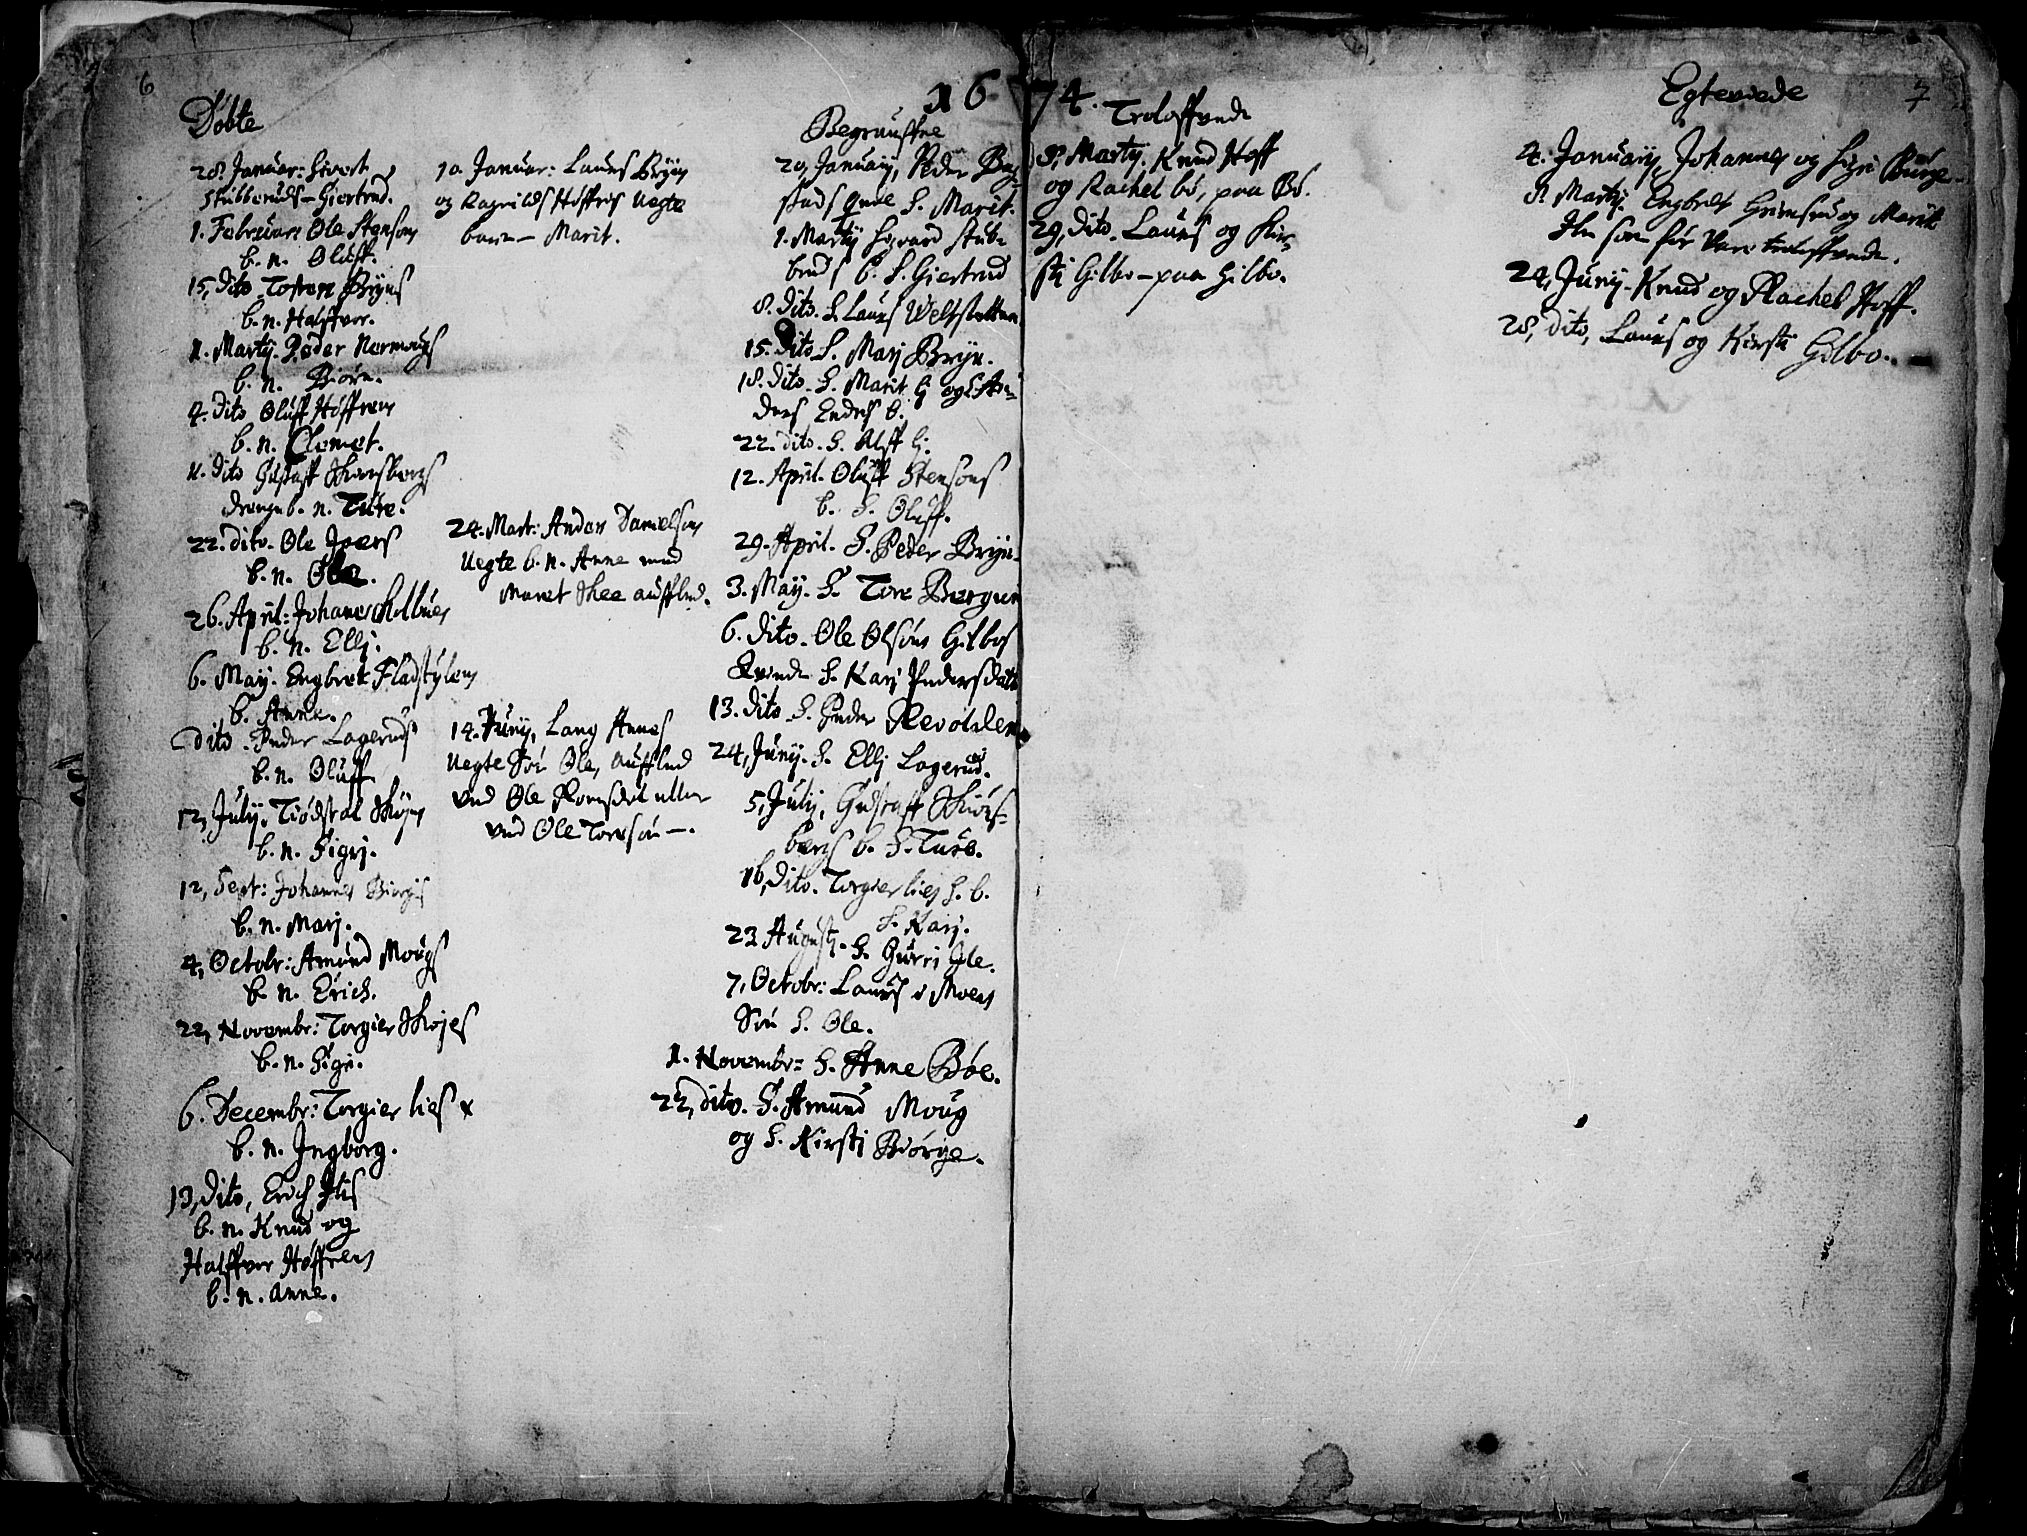 SAH, Øyer prestekontor, Ministerialbok nr. 1, 1671-1727, s. 6-7